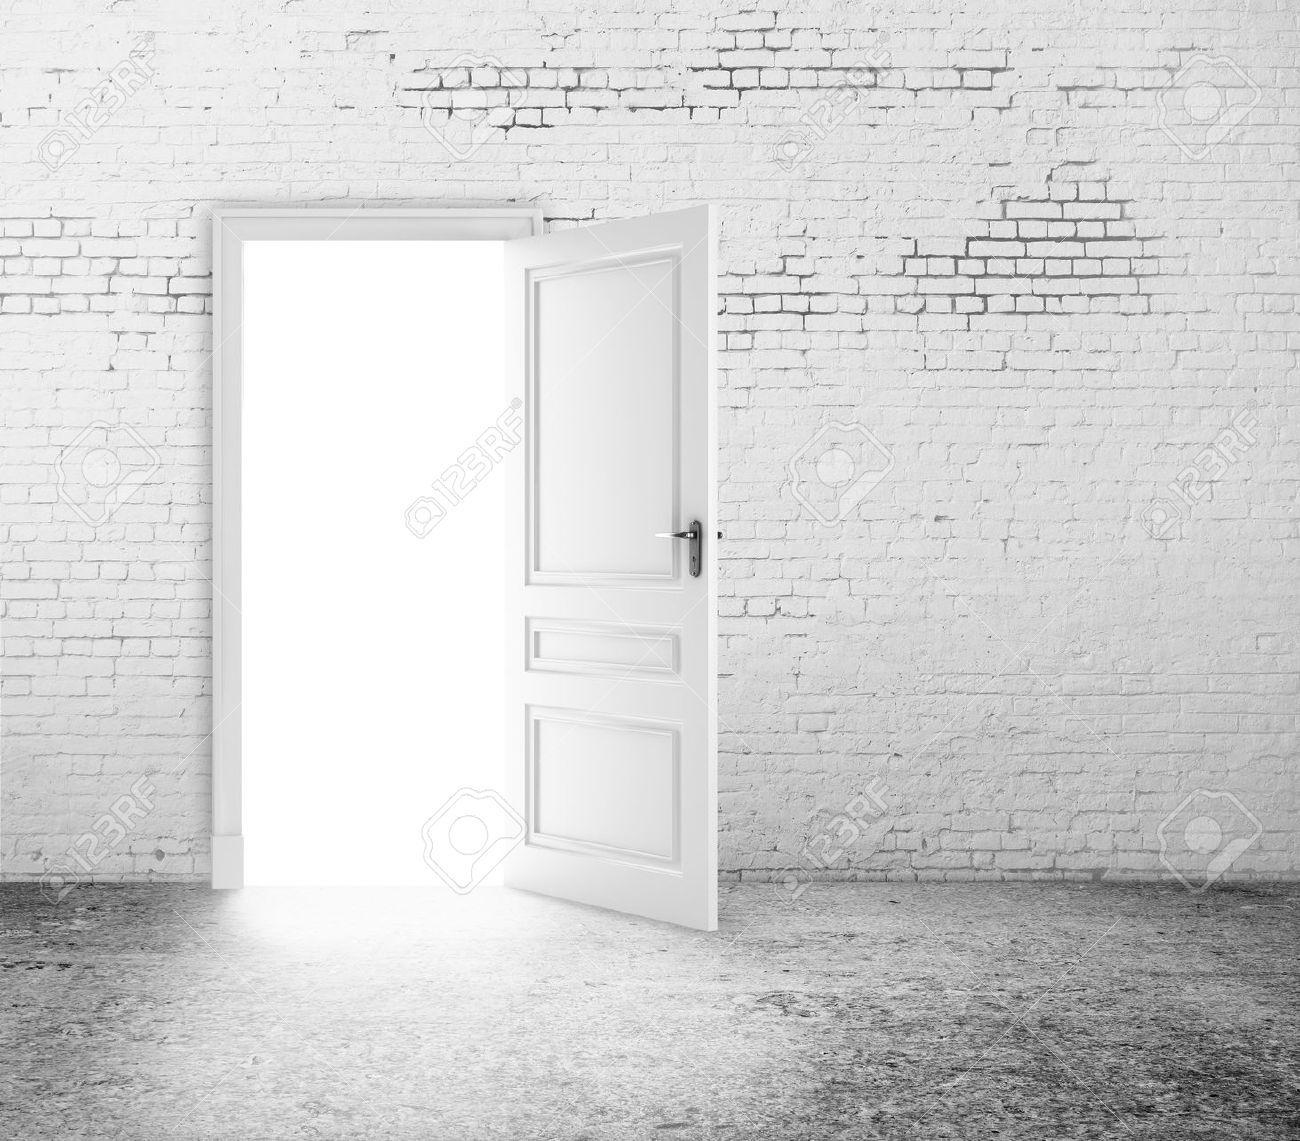 Open Door In White Brick Wall White Brick Walls White Brick Brick Wall